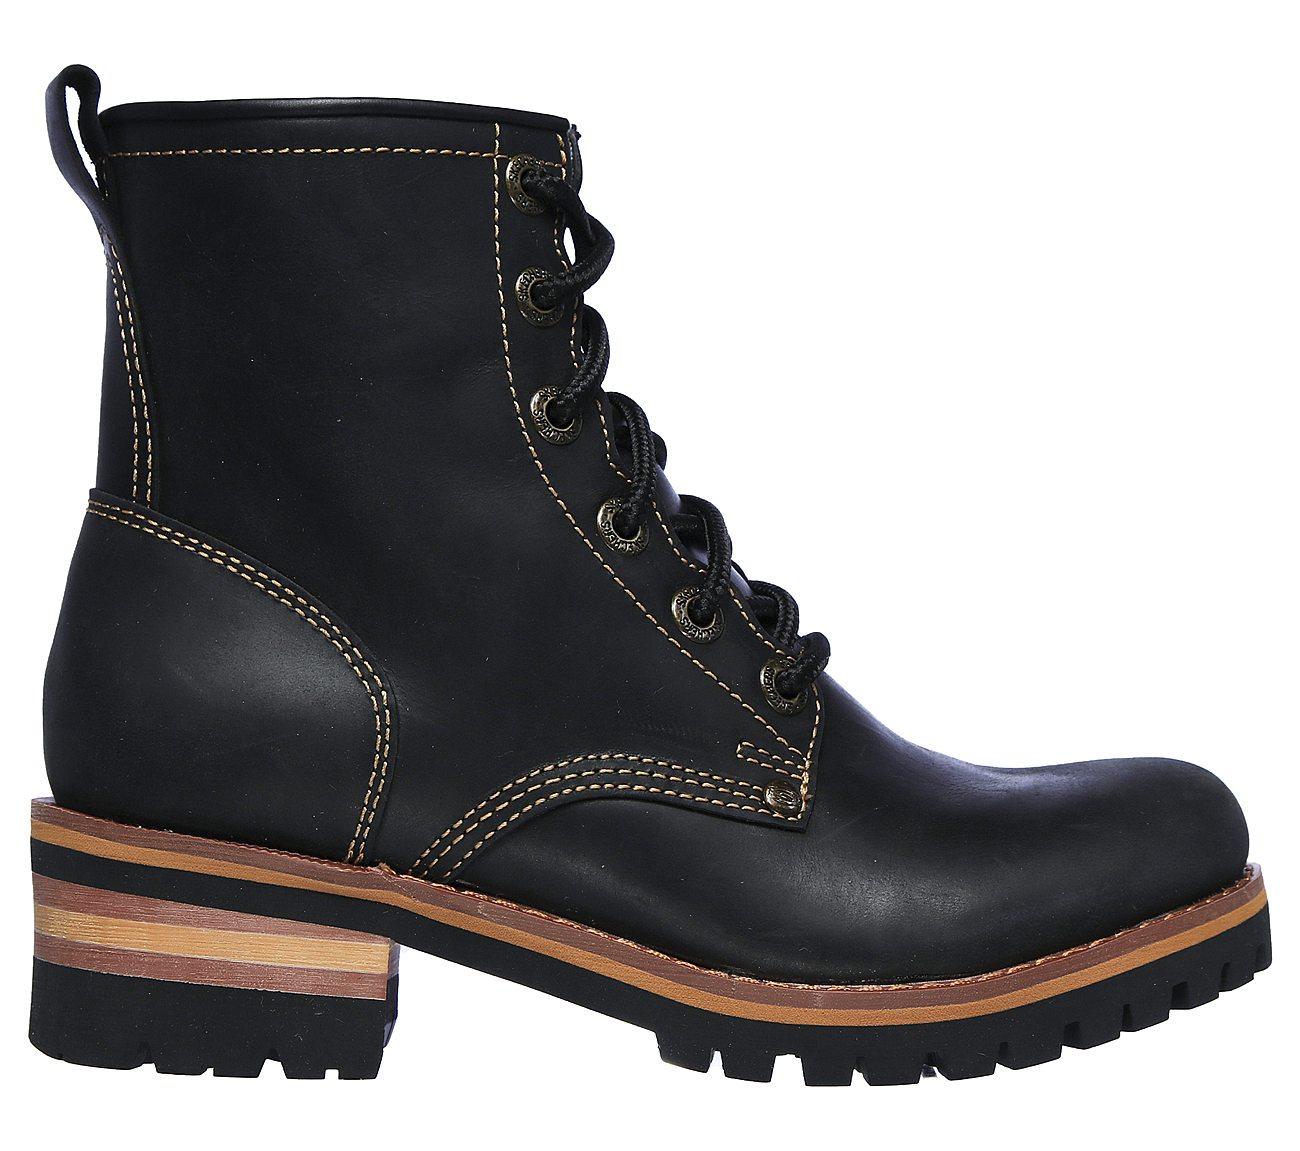 skechers mens boots with zipper